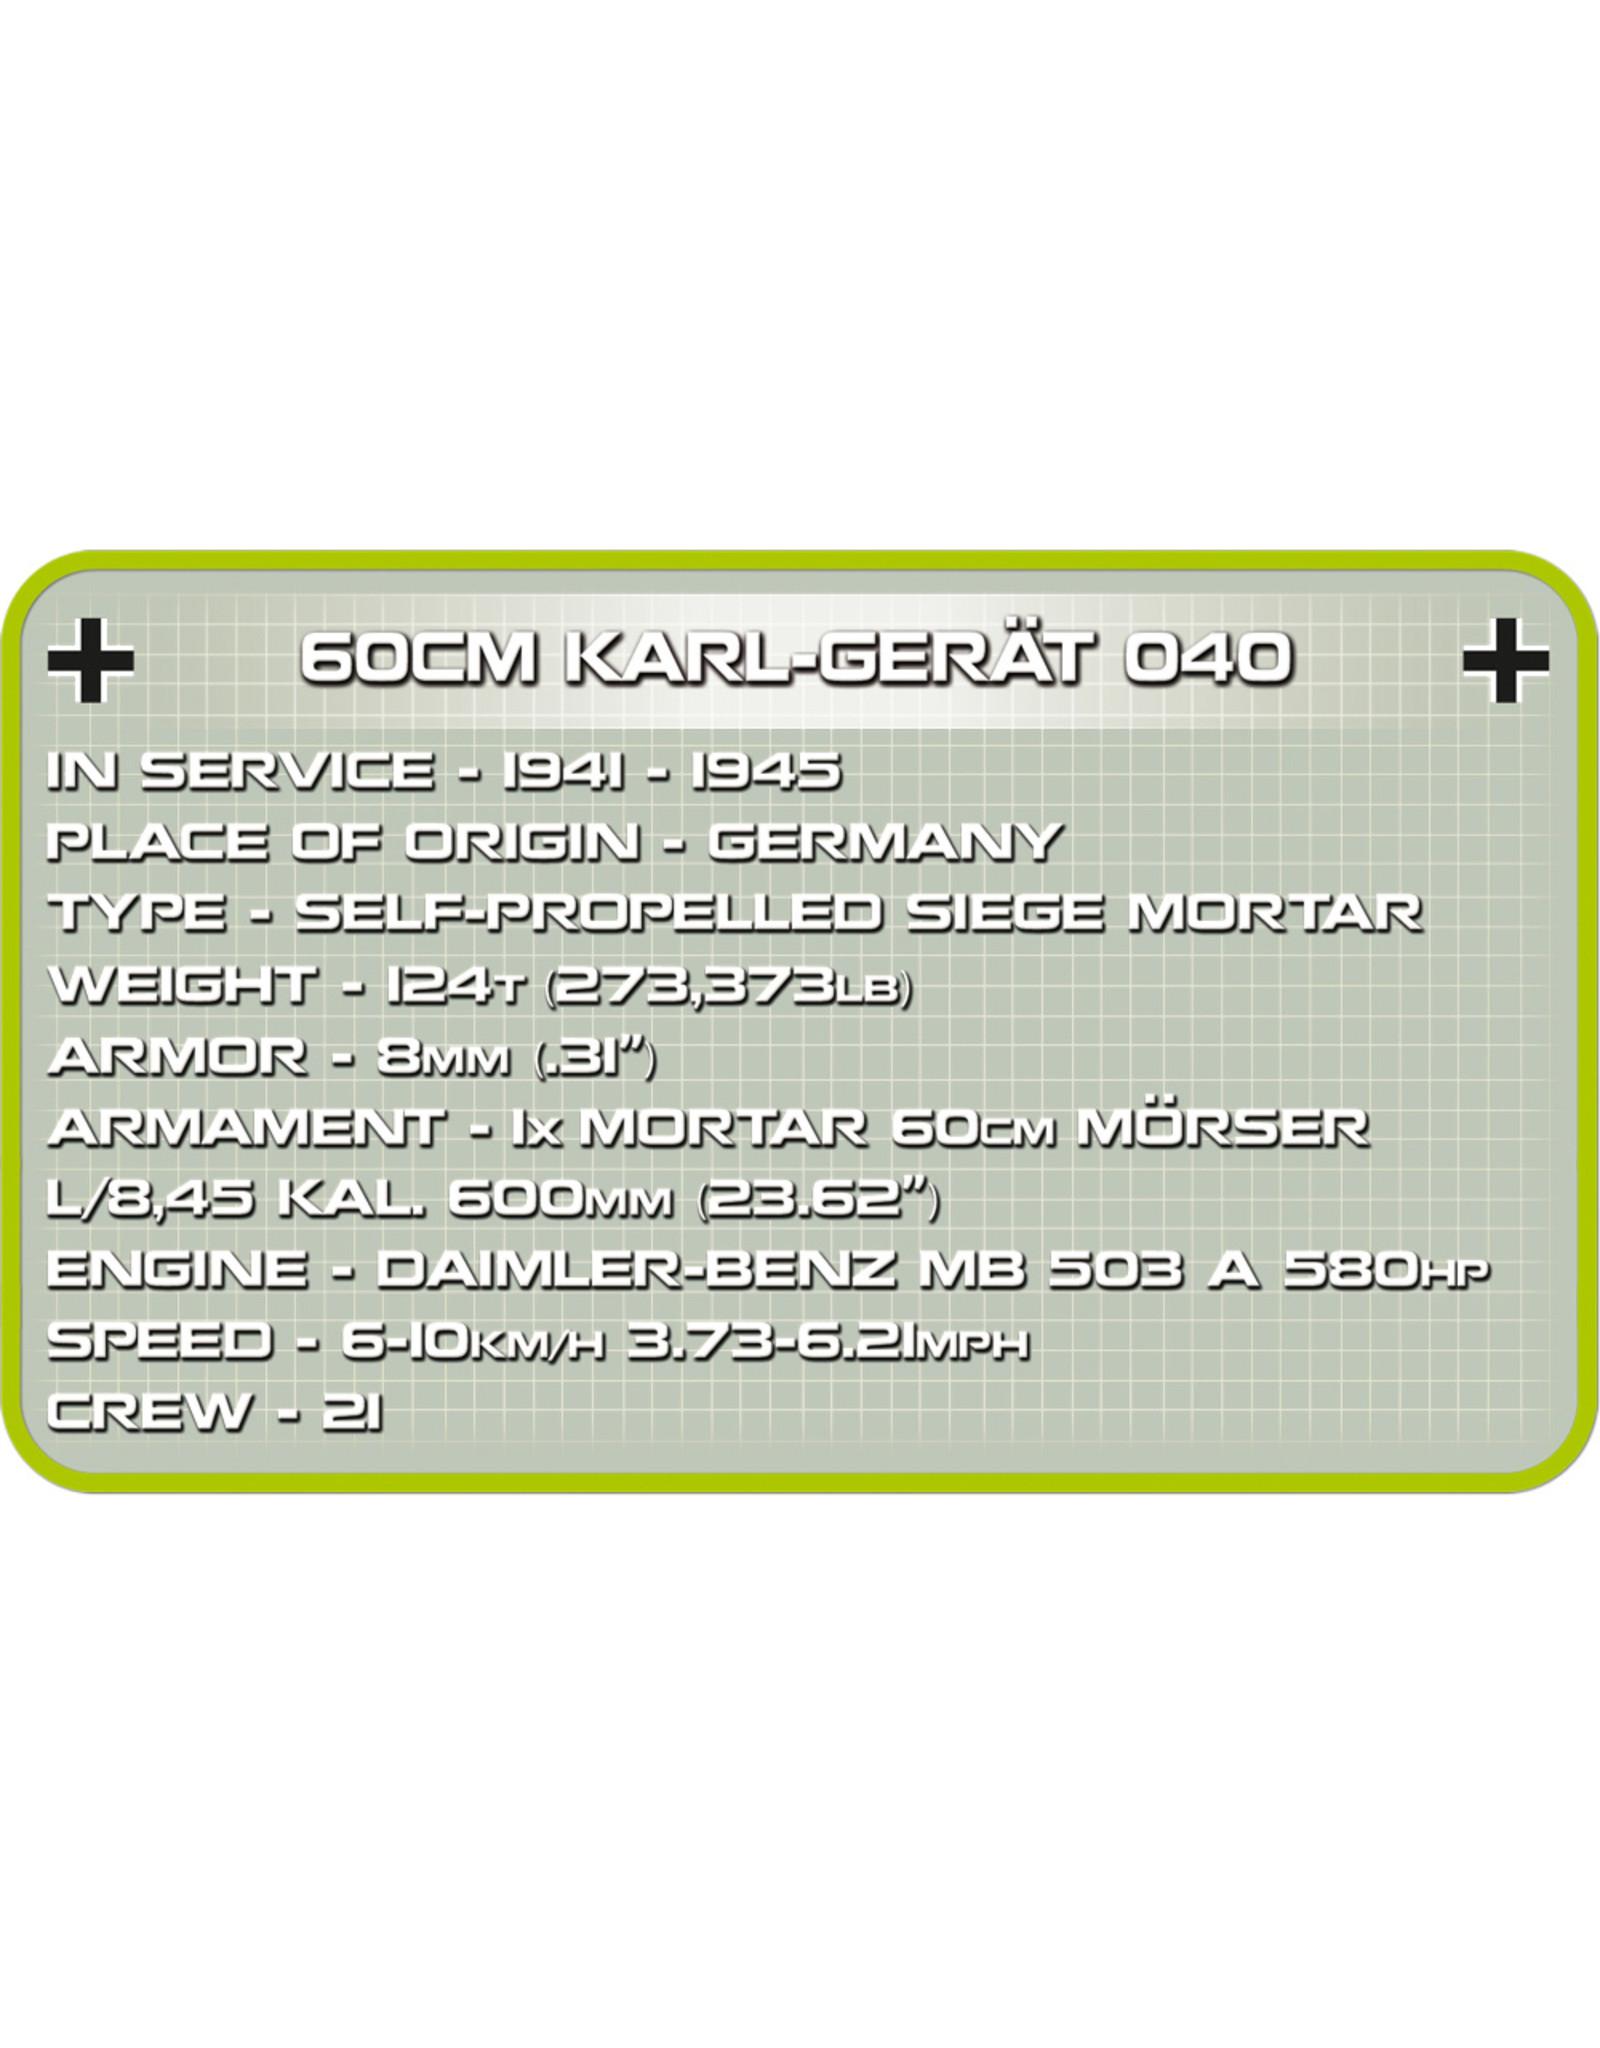 COBI COBI WW2 2530 60cm Karl-Gerat 040 Adam